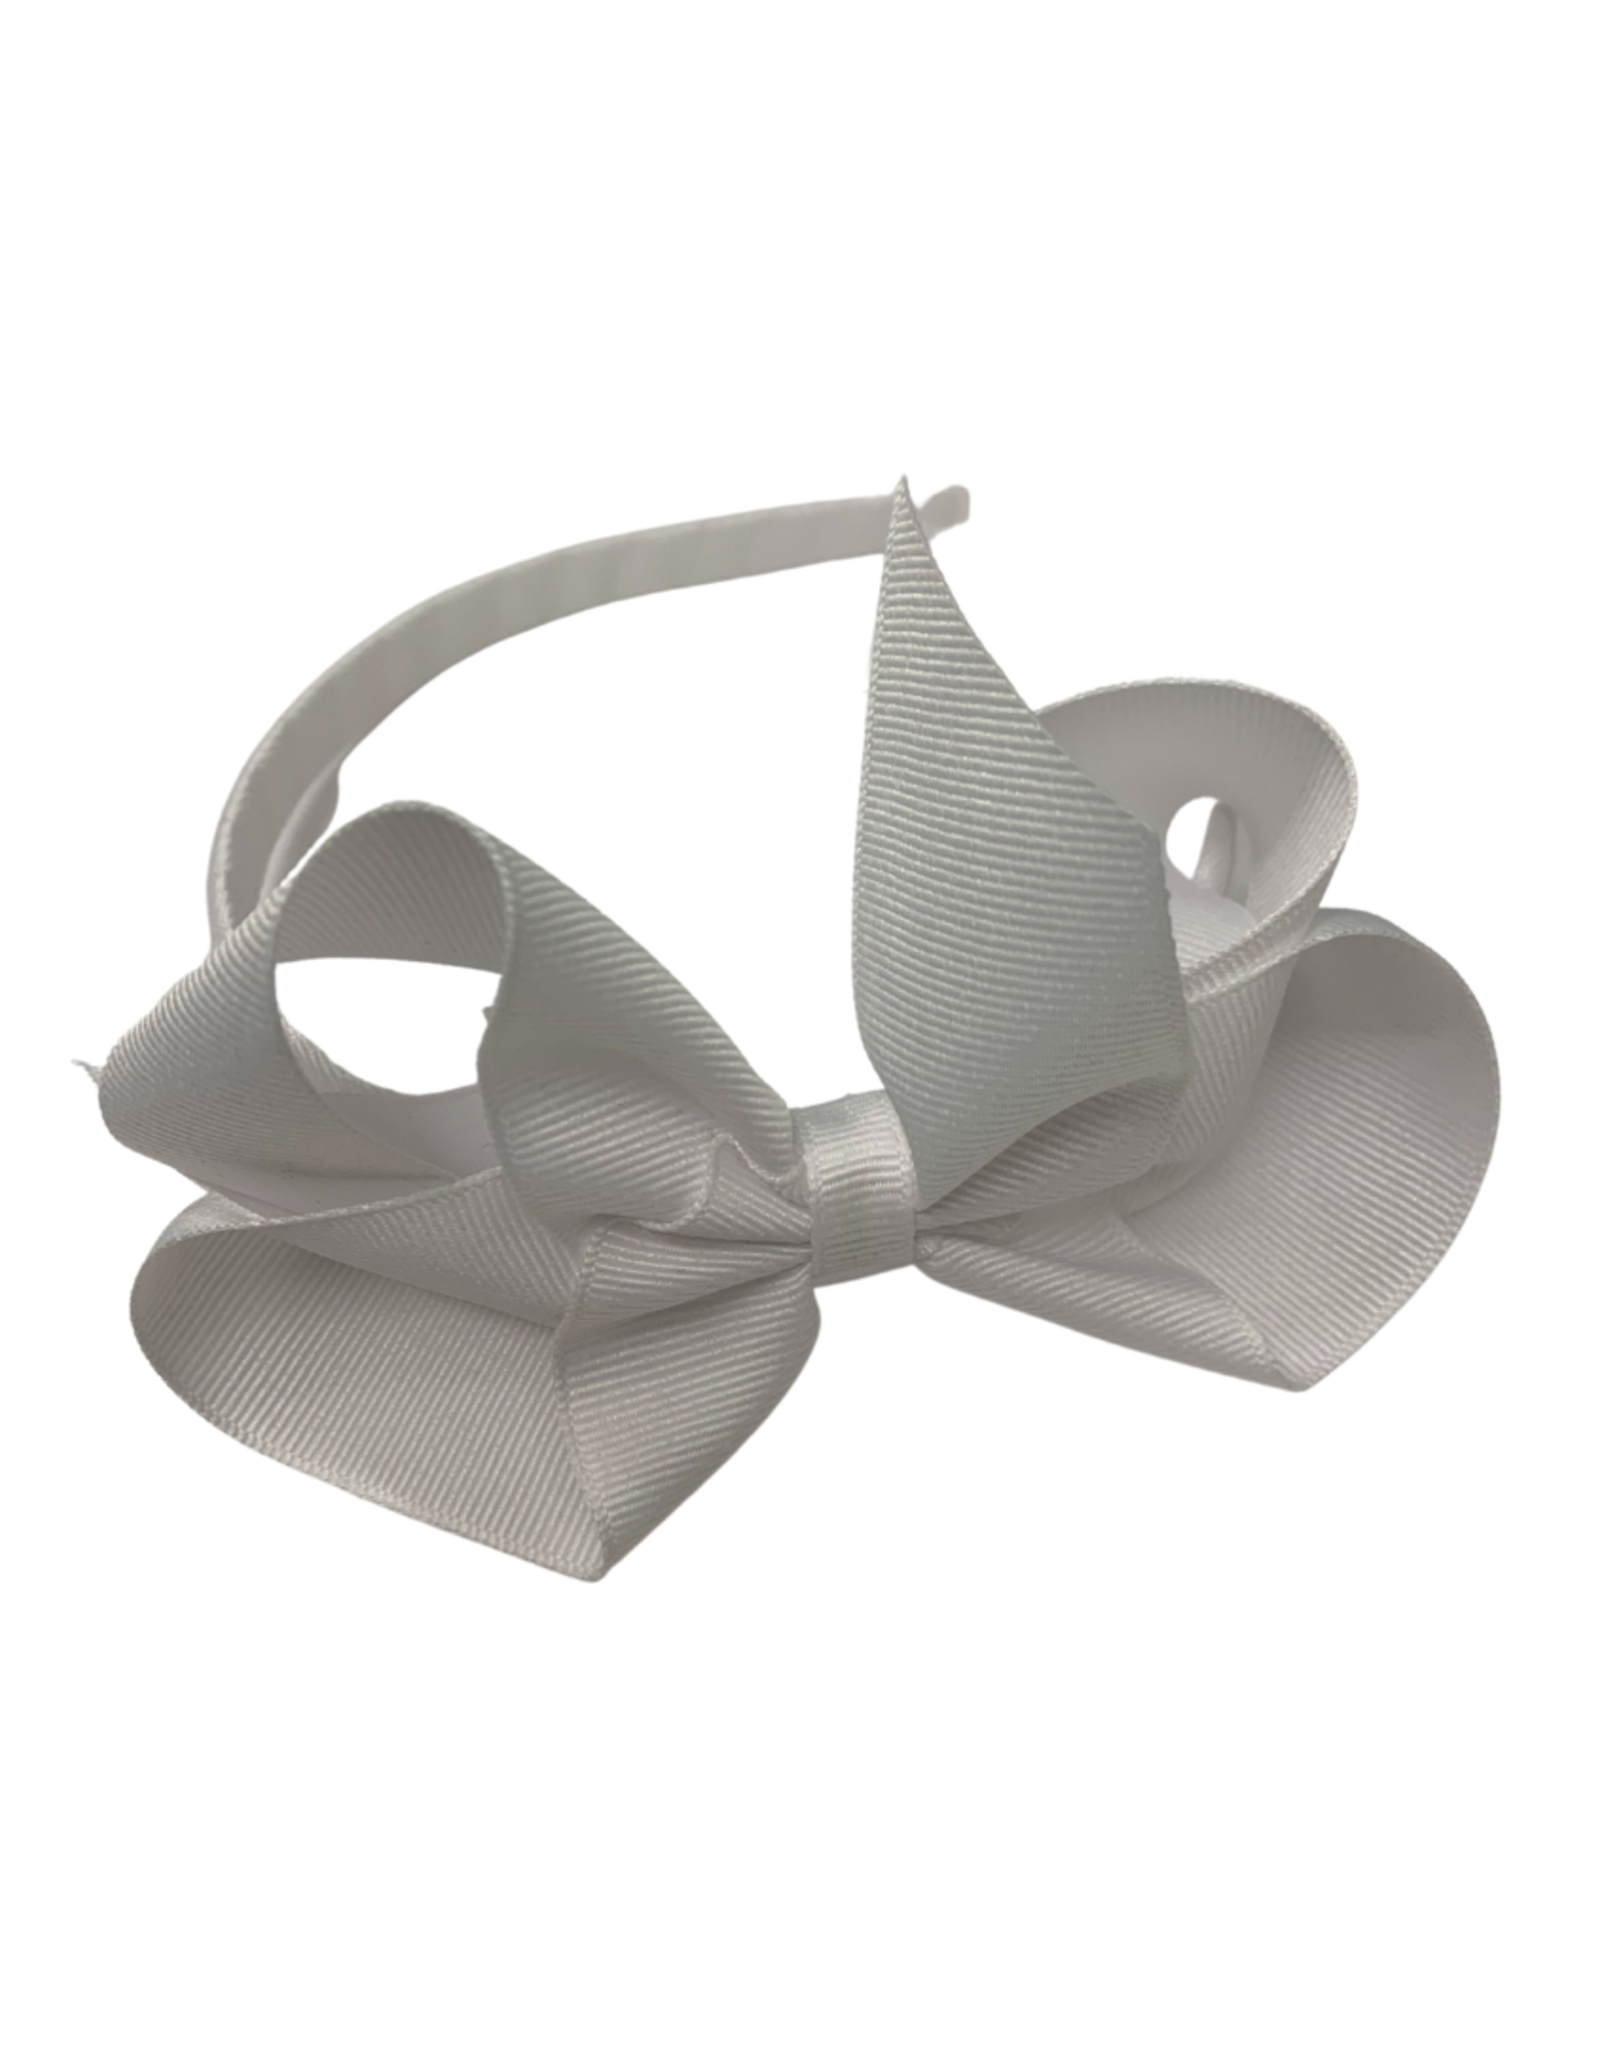 Bows Arts Big Classic Bow Headband - White